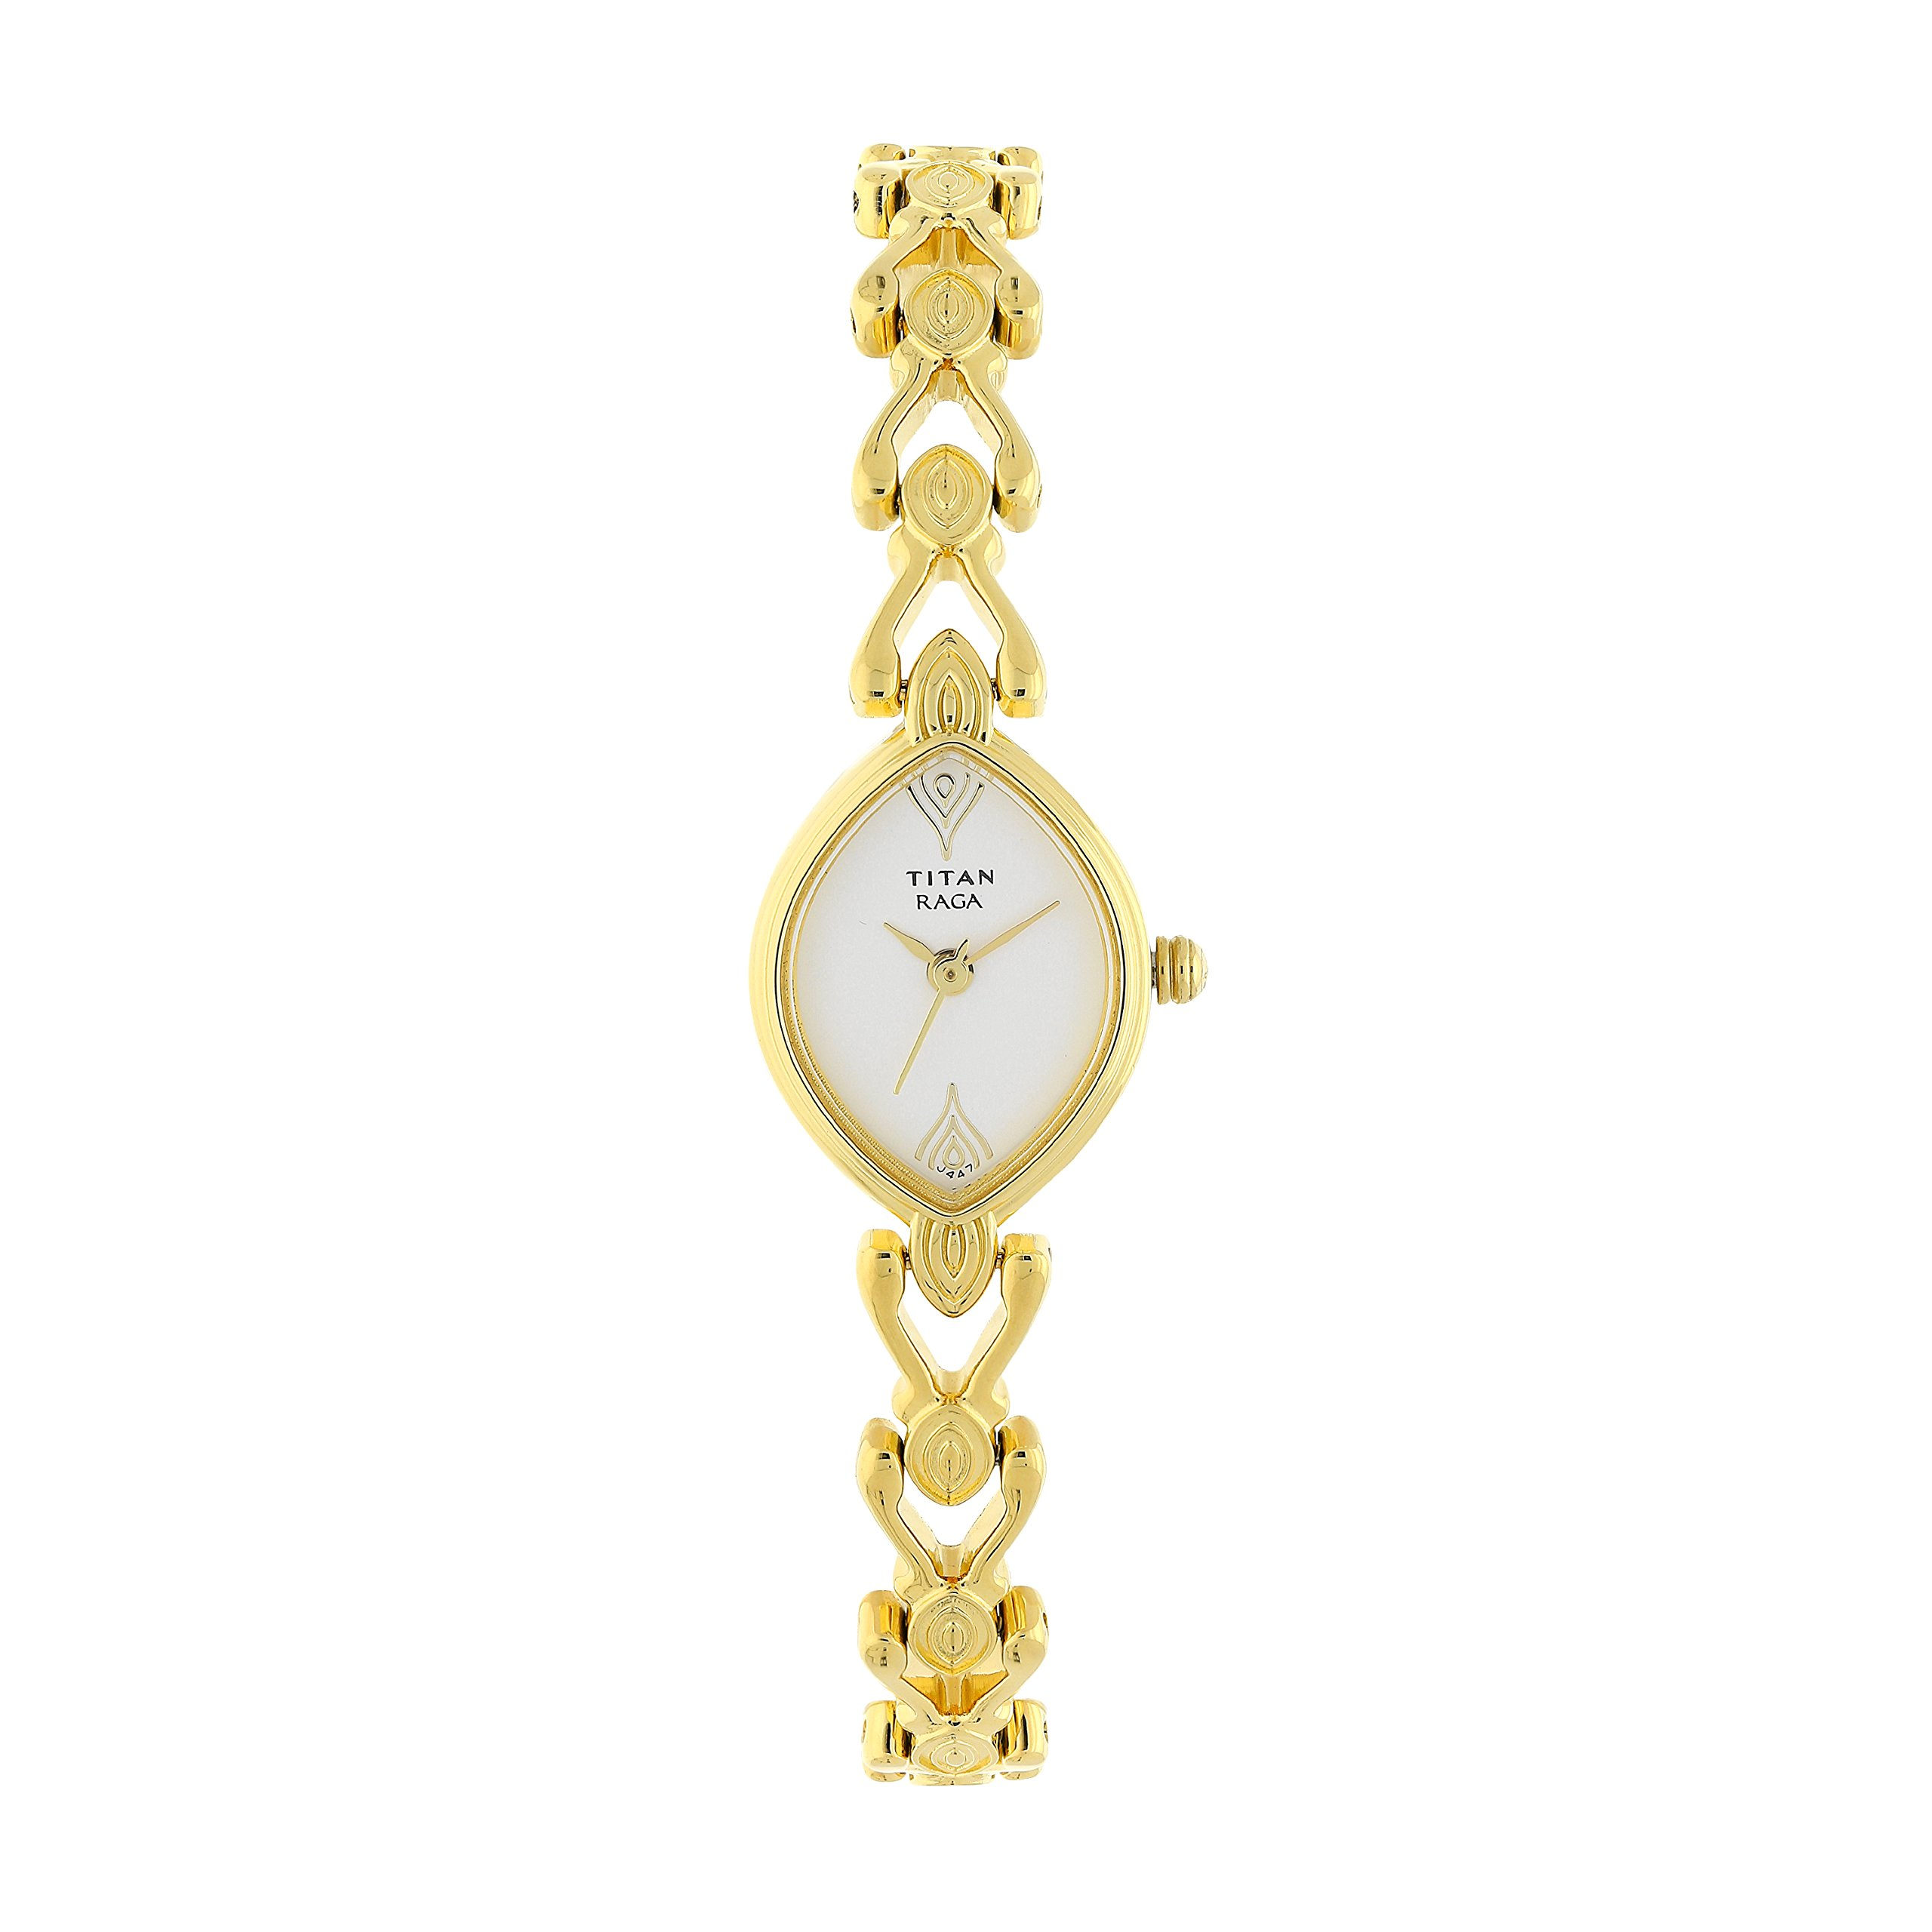 Titan Women's Raga Gold Metal Jewellery, Bracelet Clasp, Quartz Glass, Water Resistant Analog Wrist Watch